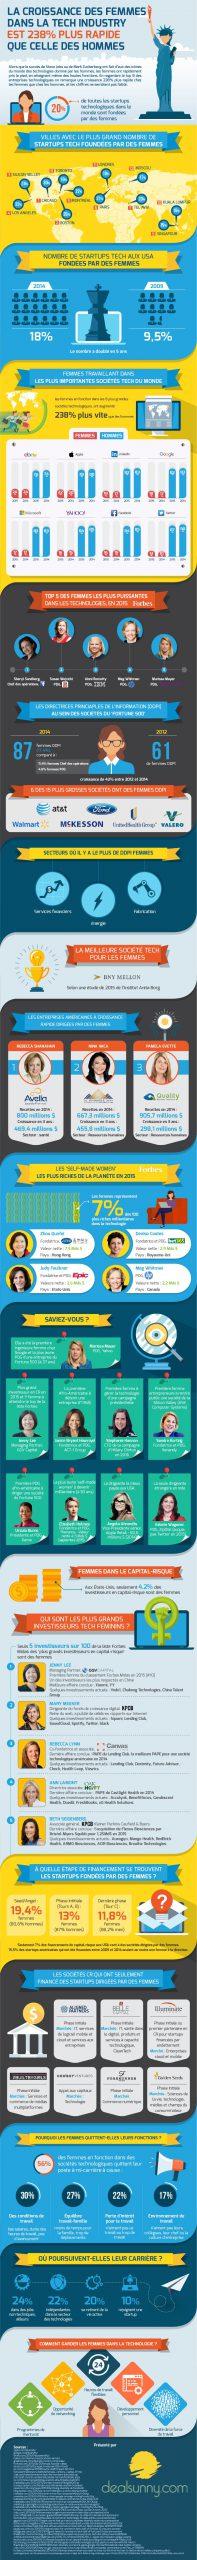 Dealsunny - Women-in-Tech